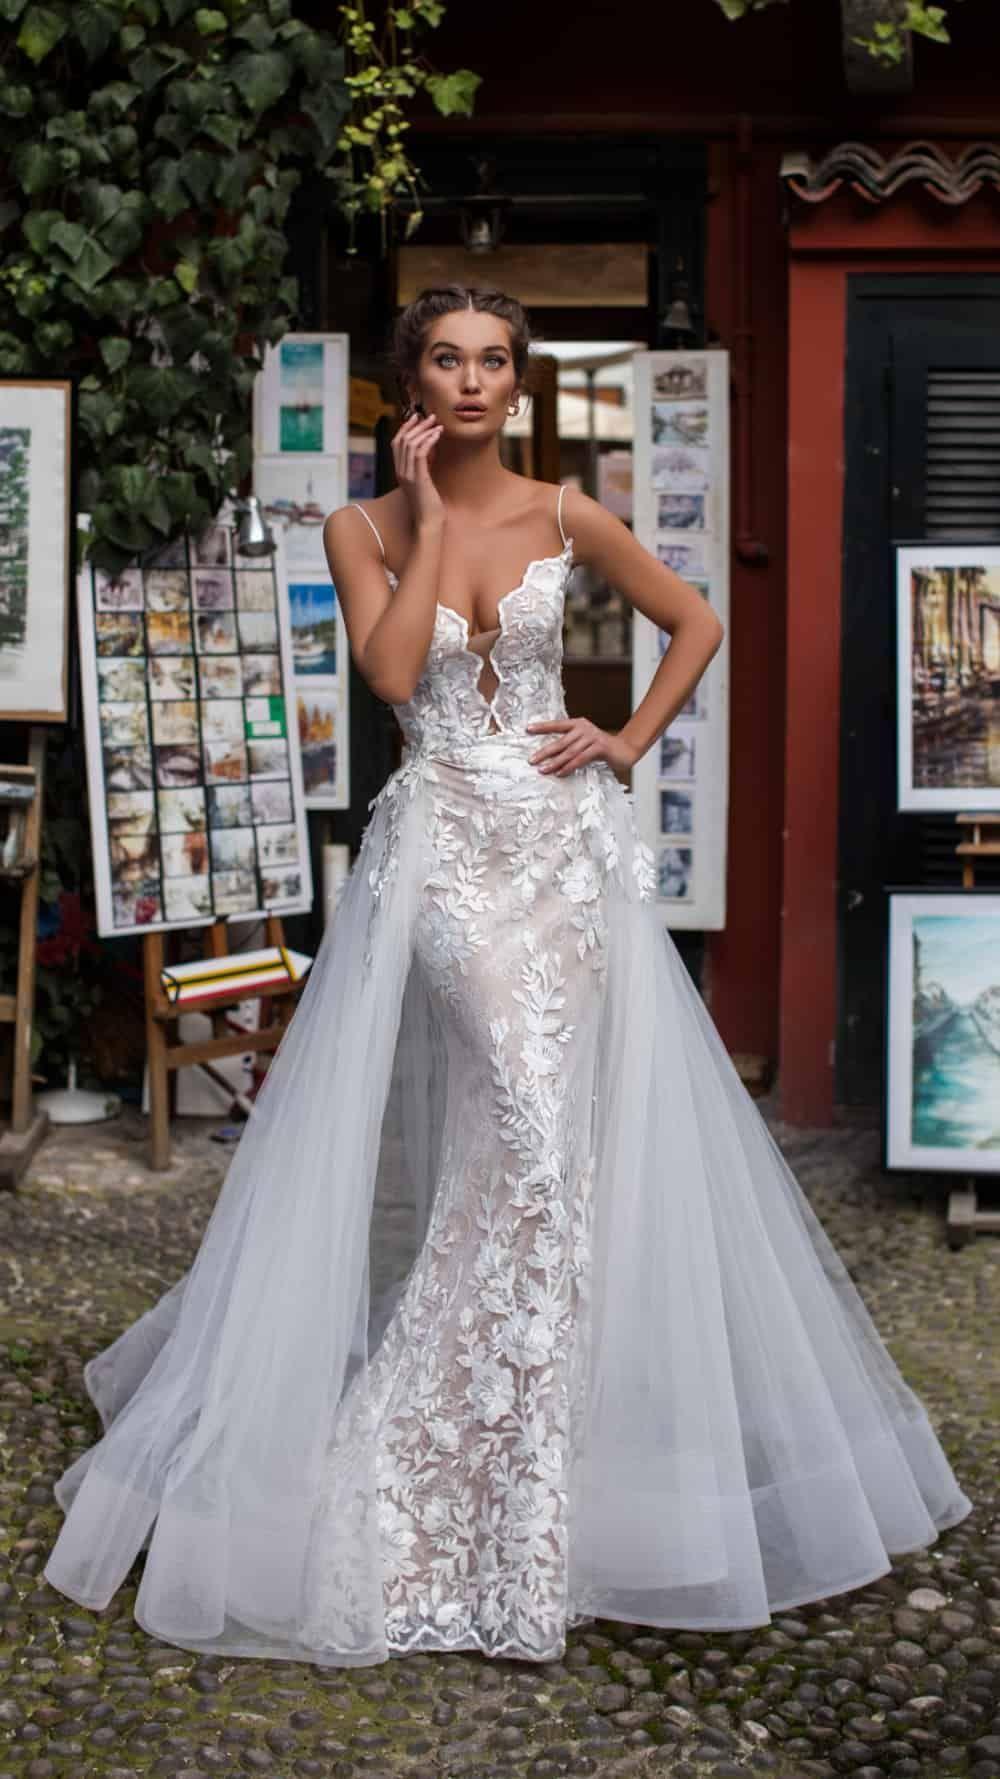 Wedding Dresses By Tarik Ediz The White Collection 2019 Dress For The Wedding Wedding Dresses A Line Wedding Dress Stunning Wedding Dresses